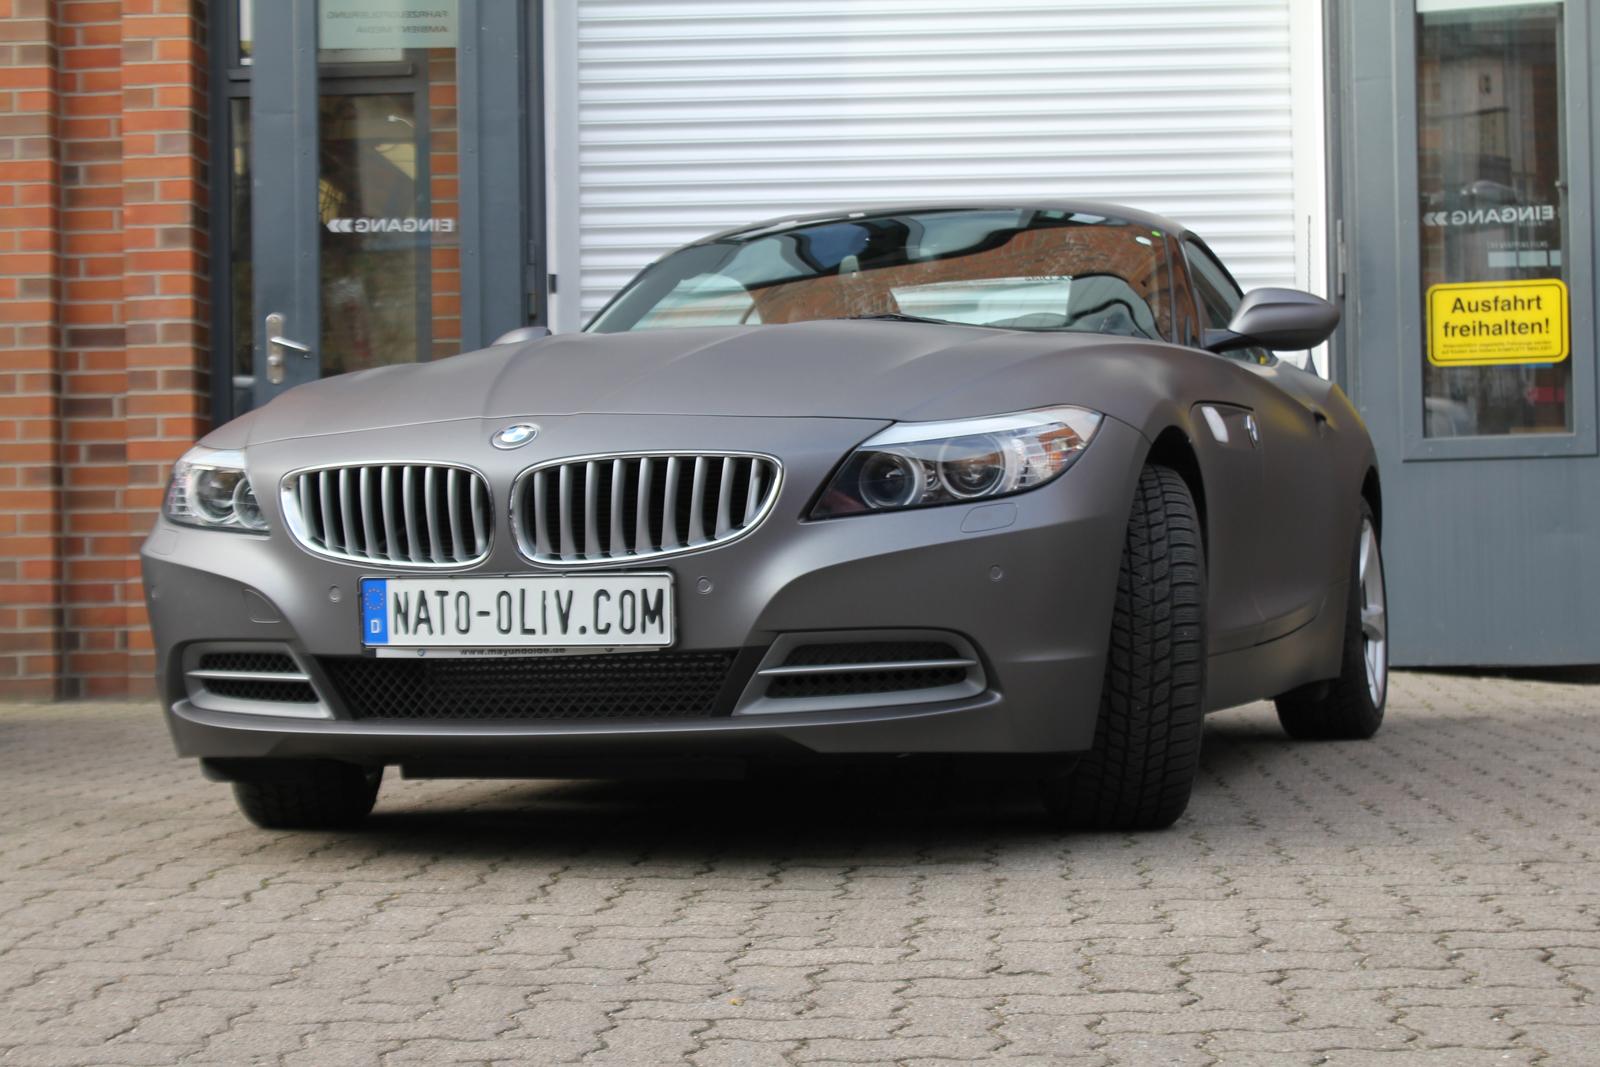 BMW_Z4_FOLIERUNG_ANTHRAZIT_METALLIC_MATT_08